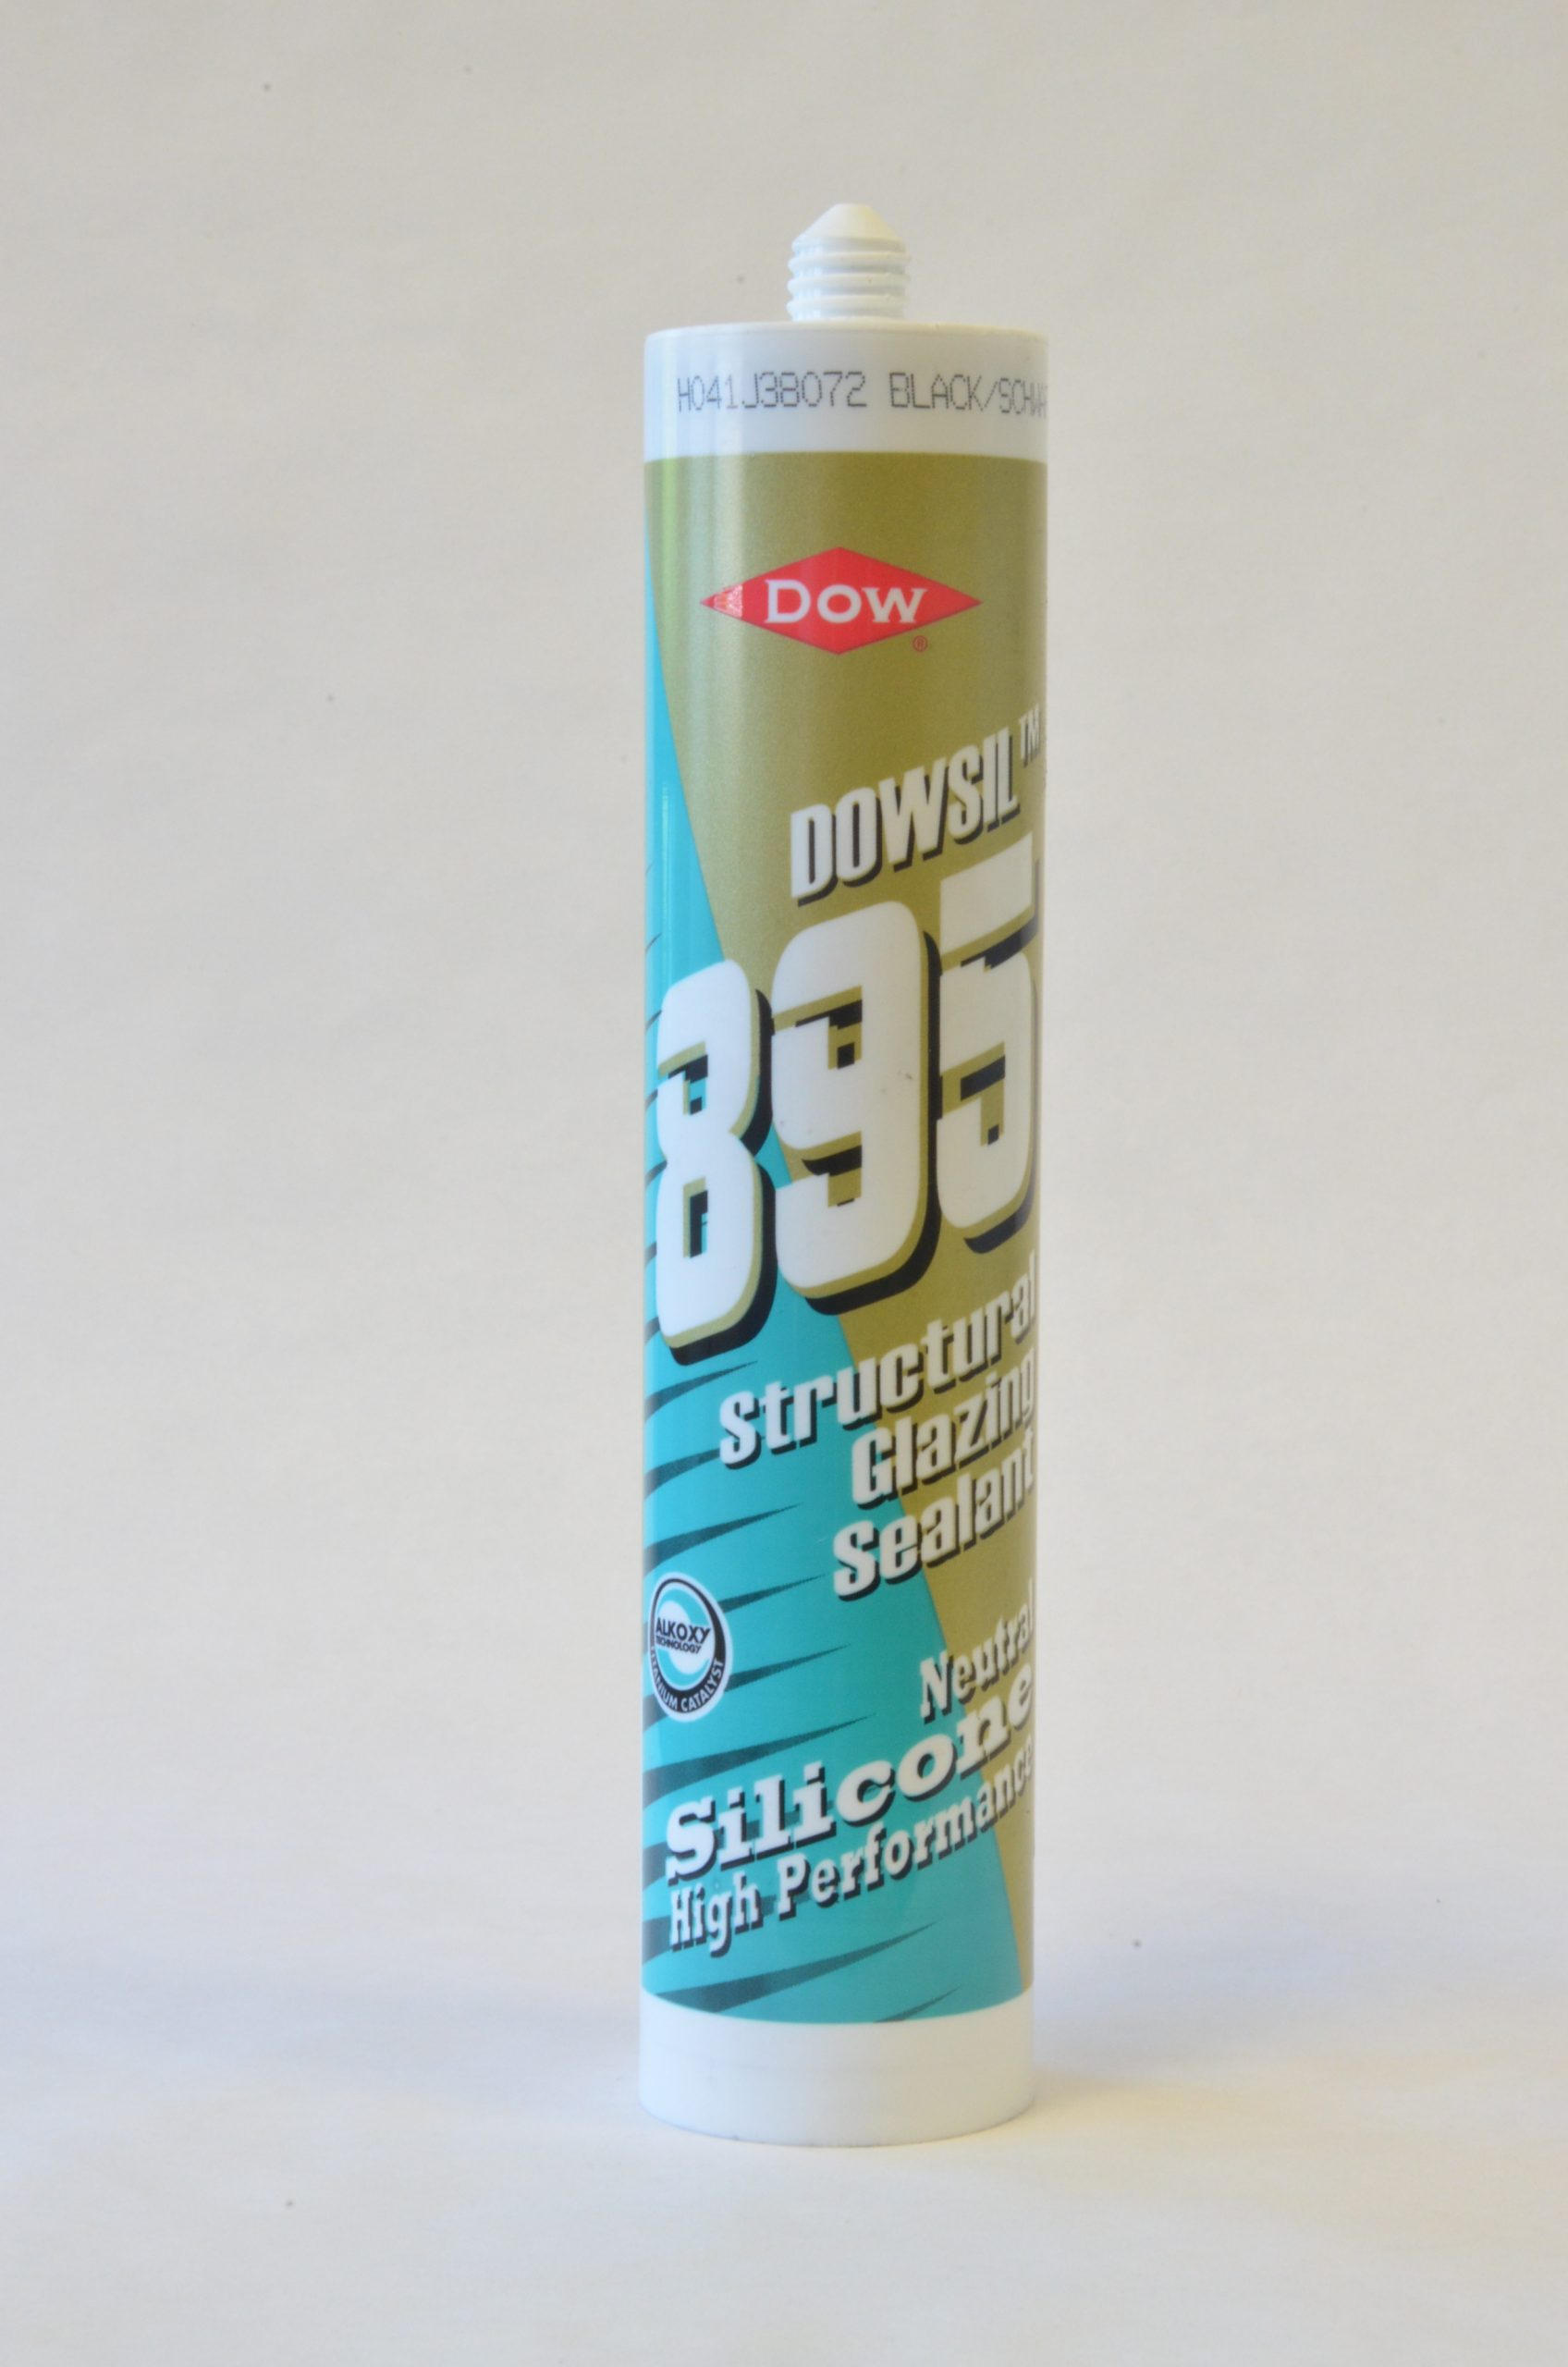 Dowsil 895